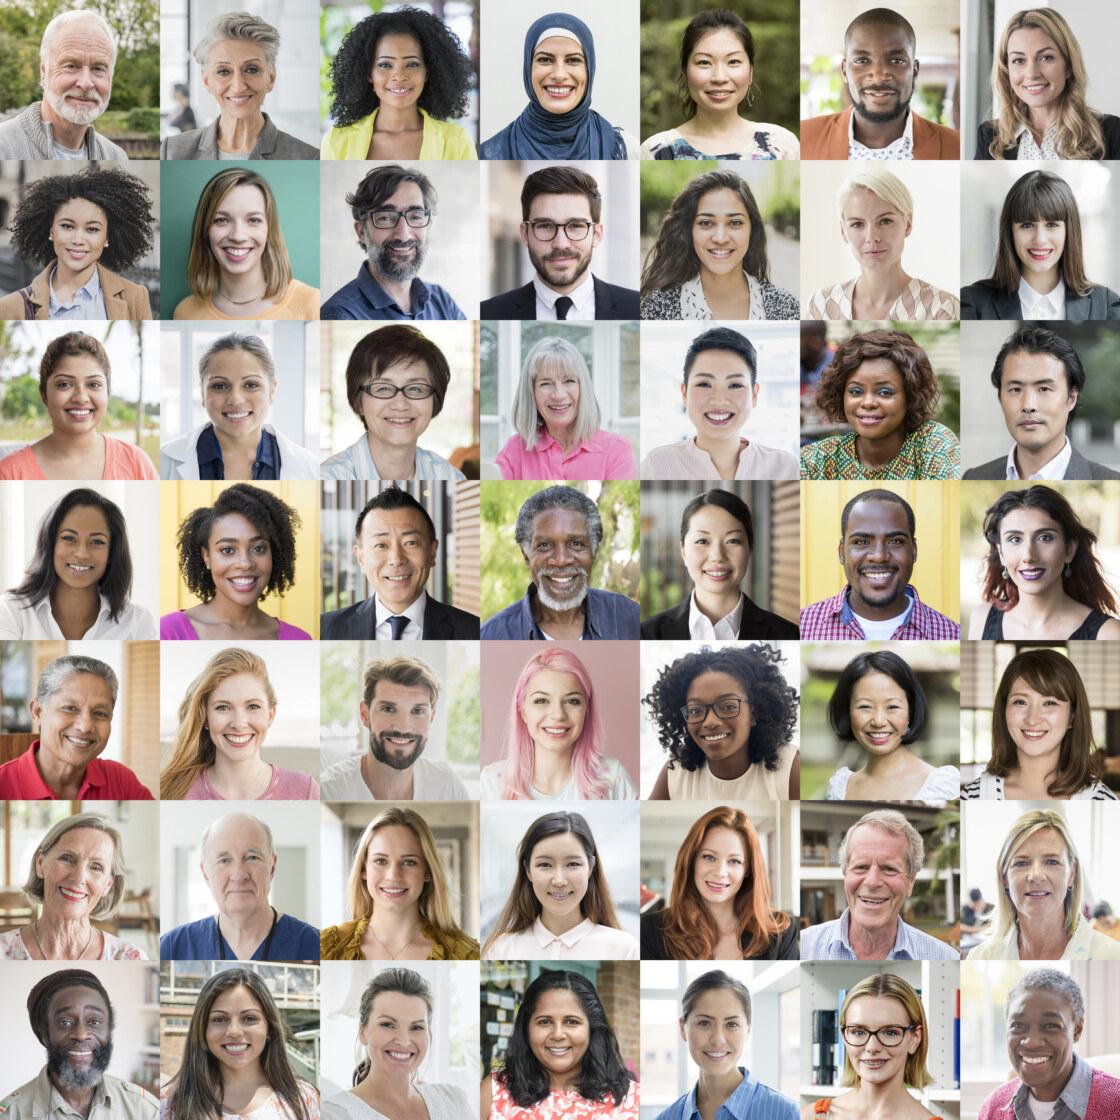 People of the world portraits – ethnic diversity